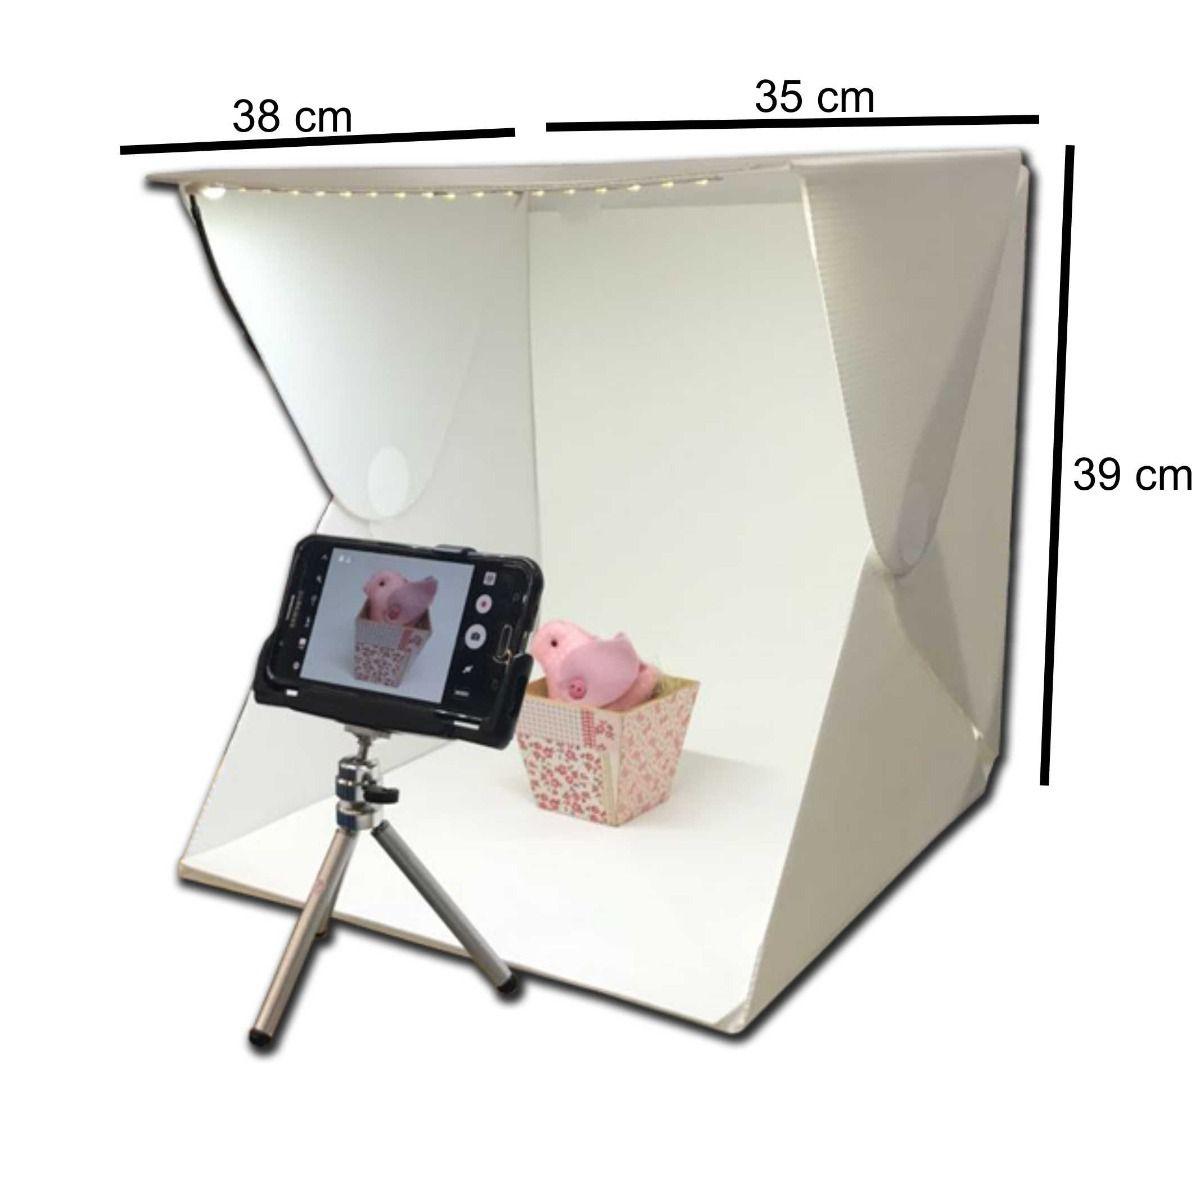 Mini Estudio de Led Para Fotografia De Produtos, Artesanatos, Ecommerce - INSTAFOLD